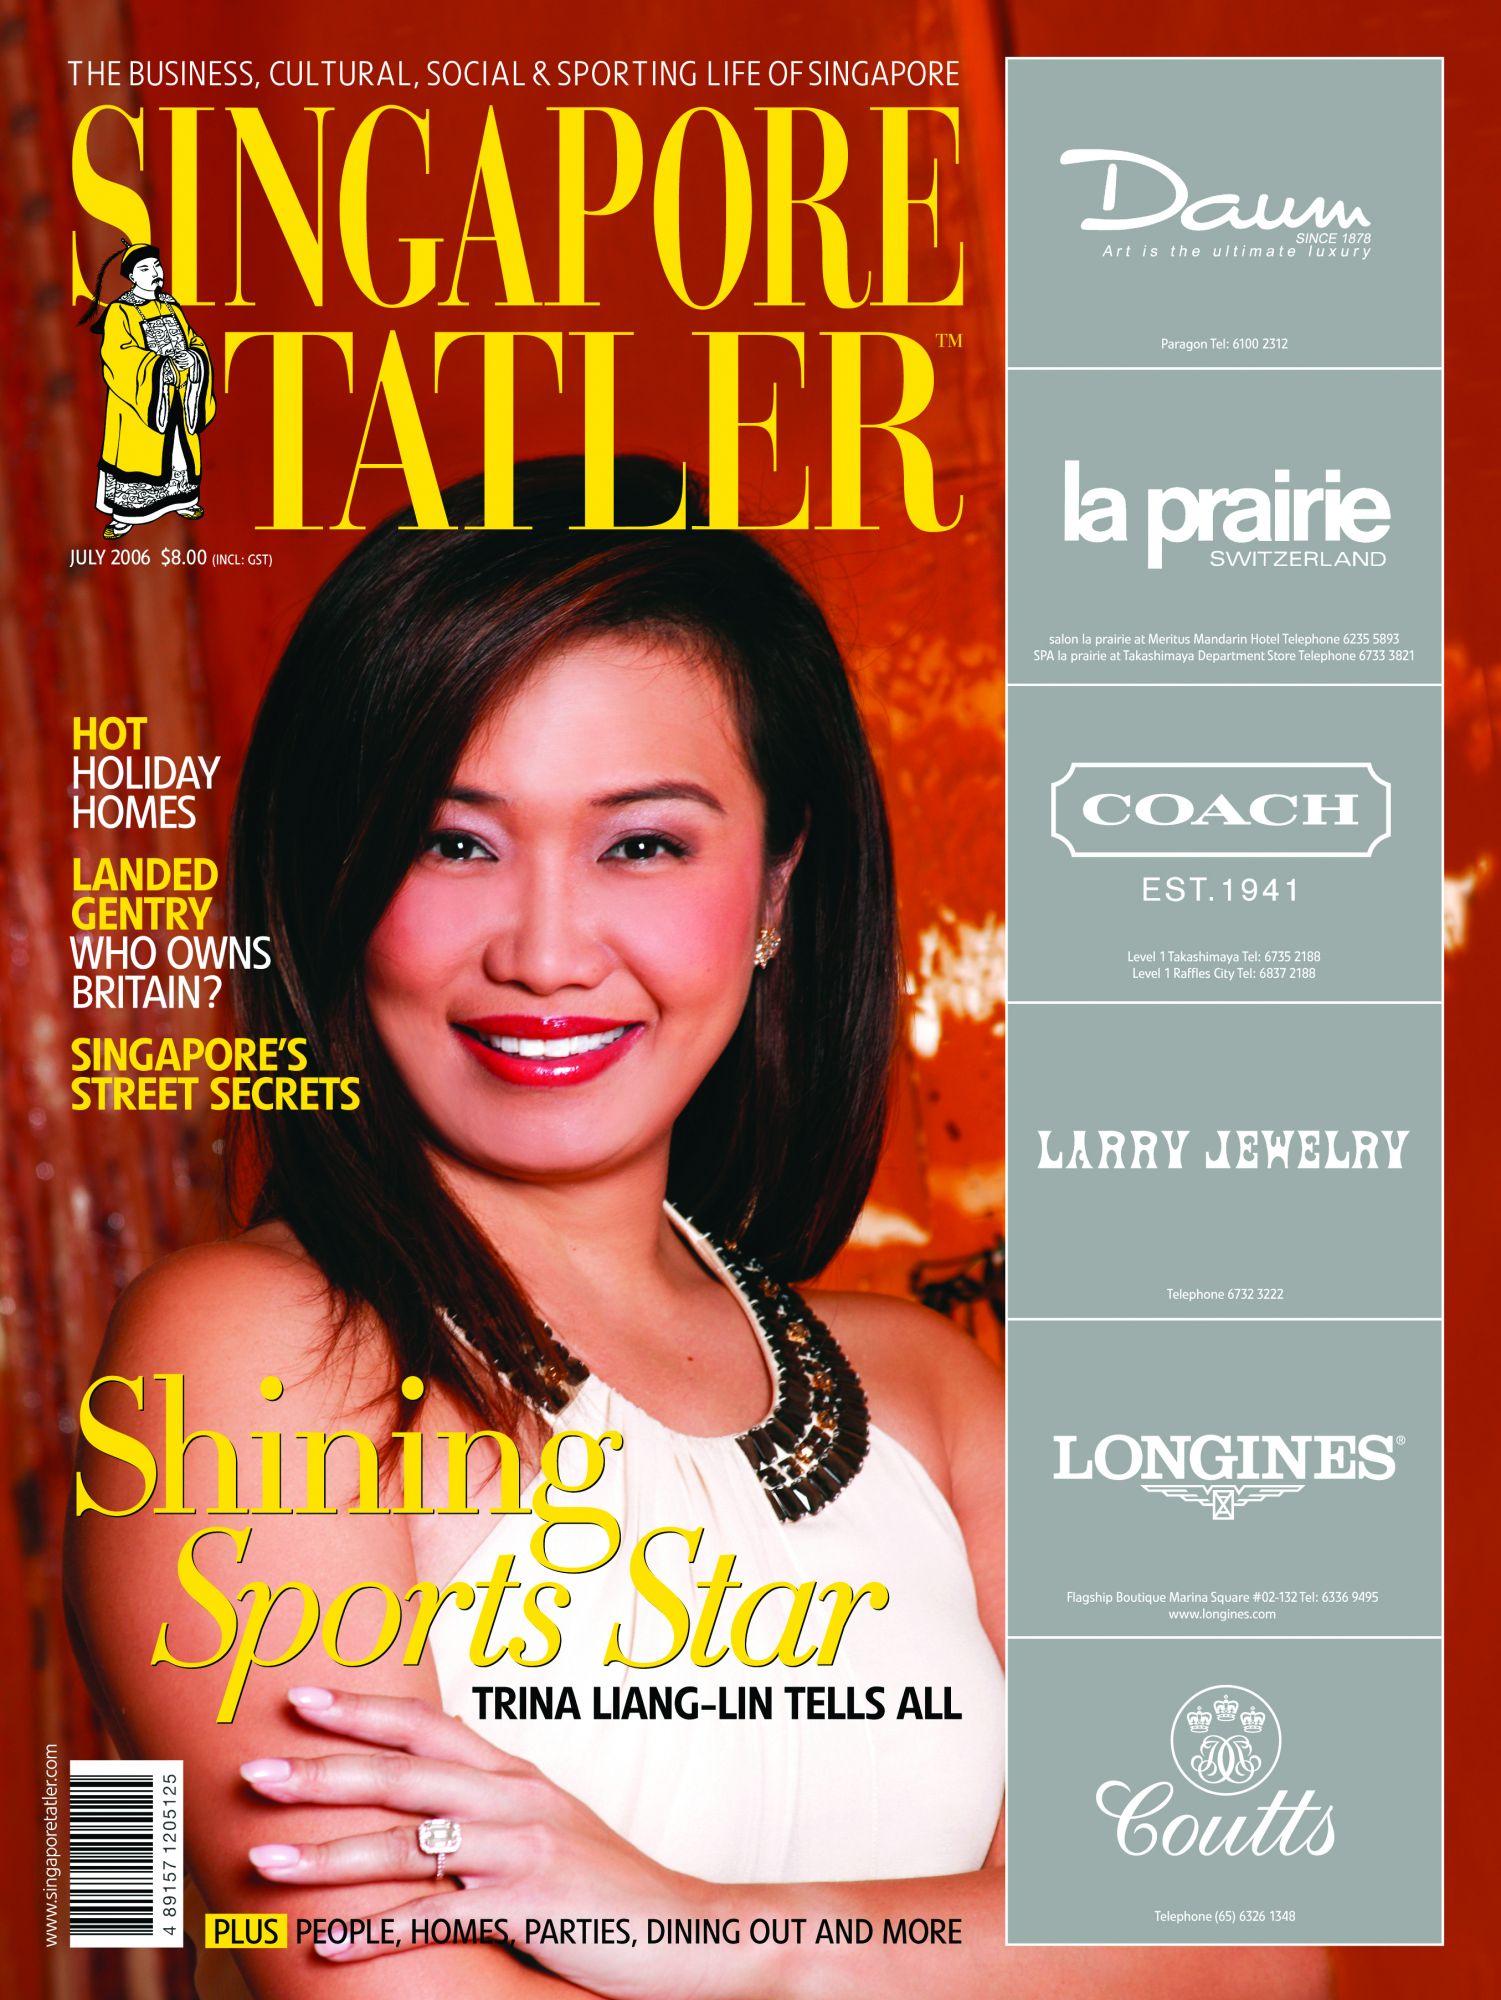 Trina Liang-Lin (Jul 2006)